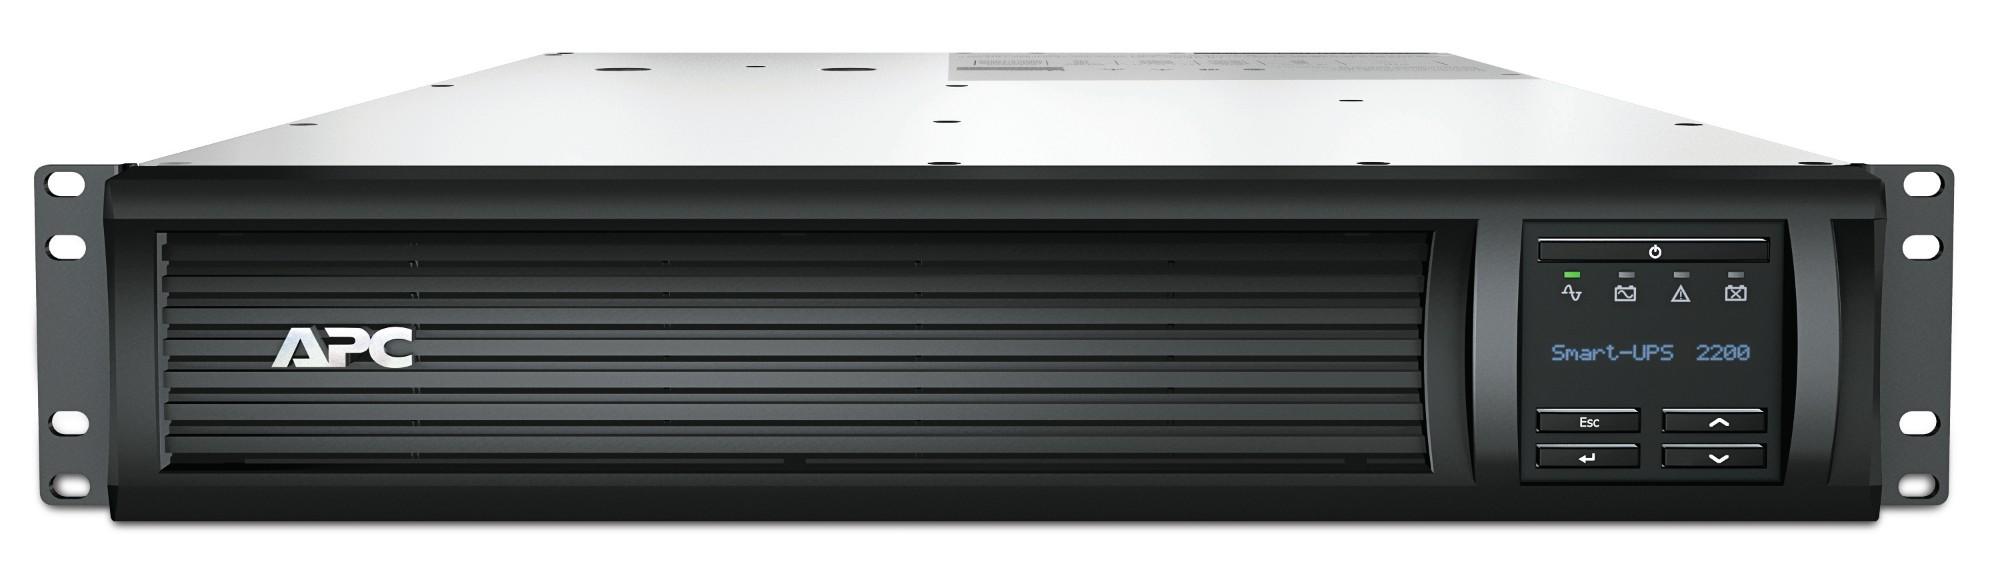 APC Smart-UPS 2200VA LCD RM 2U 230V with SmartConnect Línea interactiva 1980 W 9 salidas AC